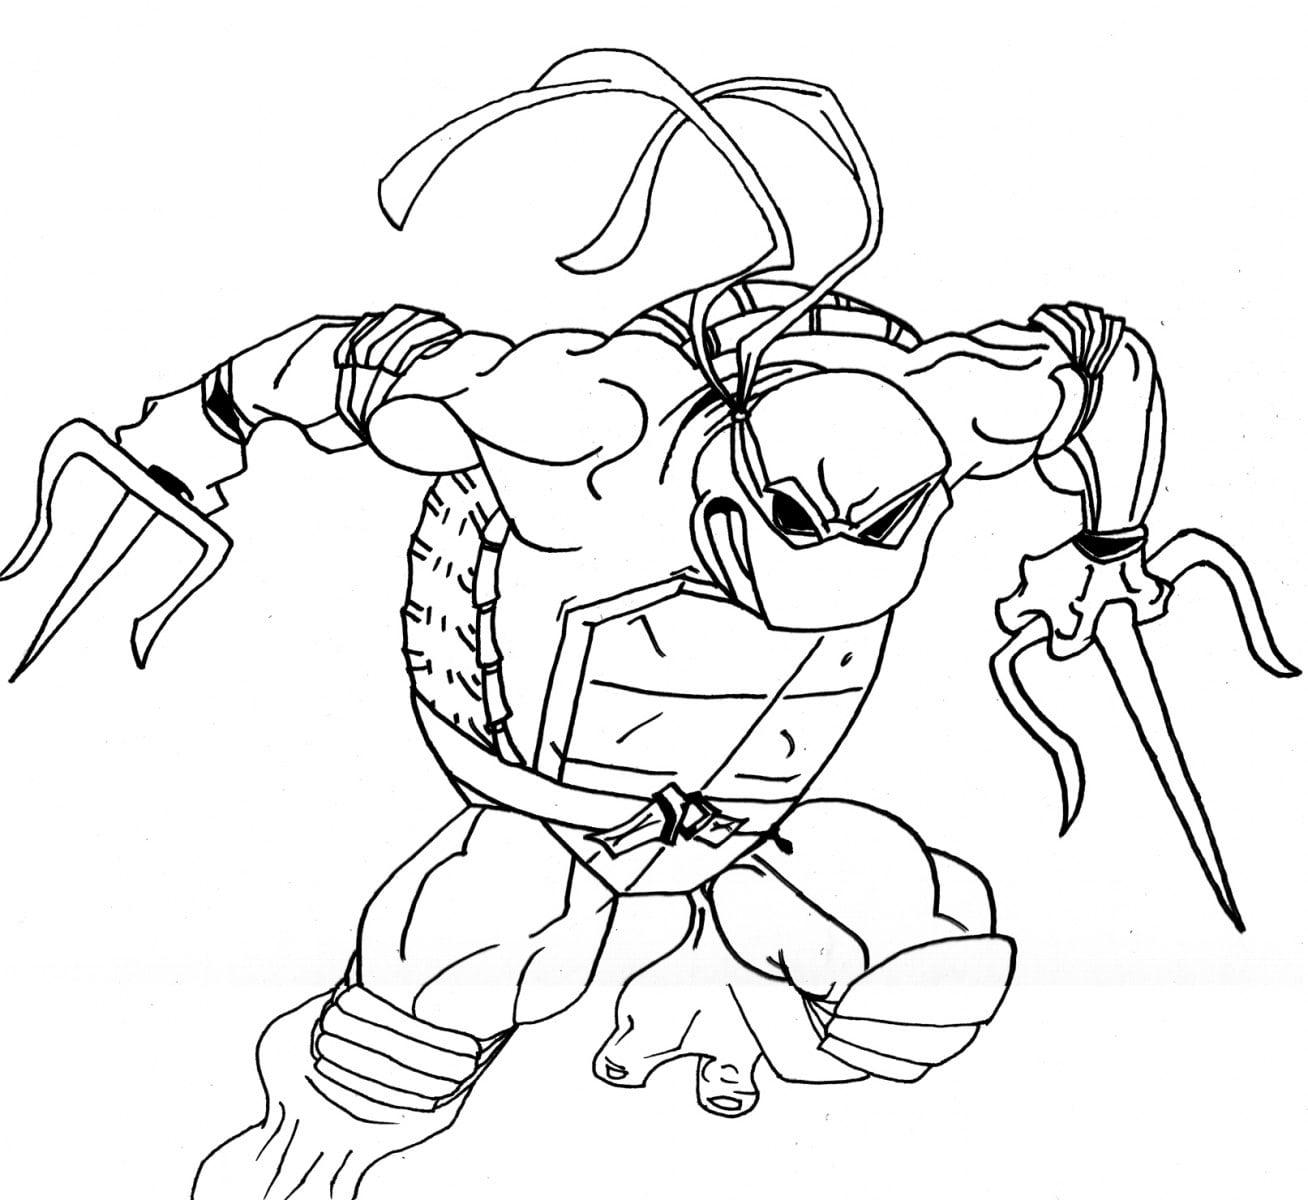 Desenhos Para Colorir Das Tartarugas Ninja  Desenhoswiki Com